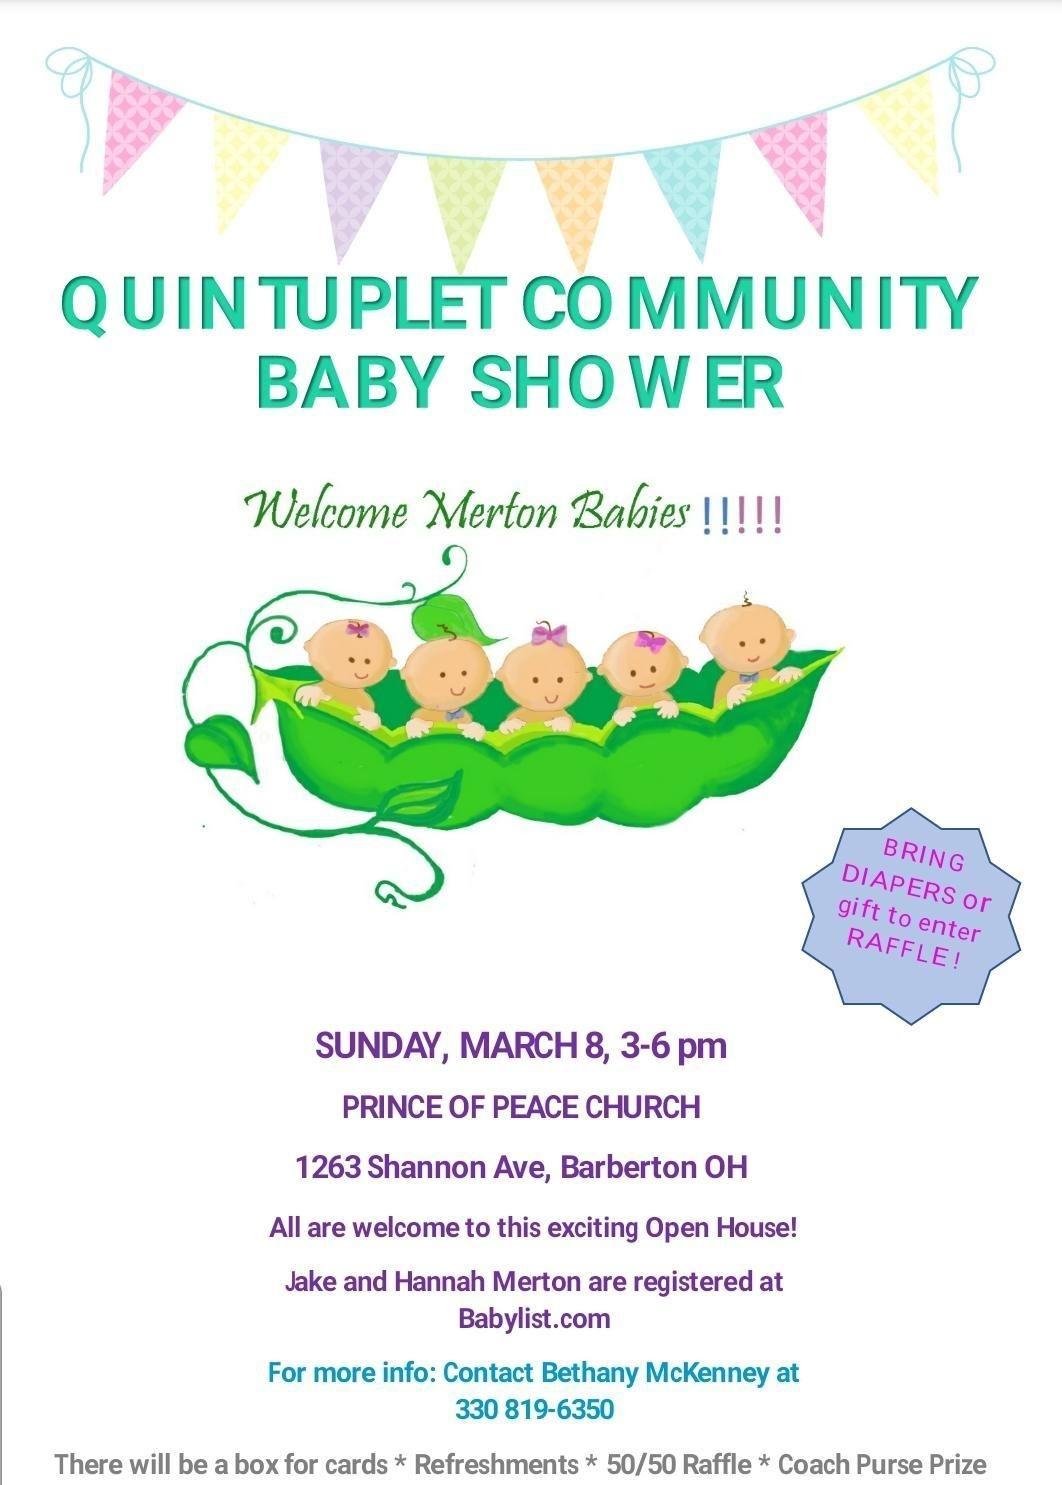 Barberton Community Prepares To Celebrate Coming Quintuplets